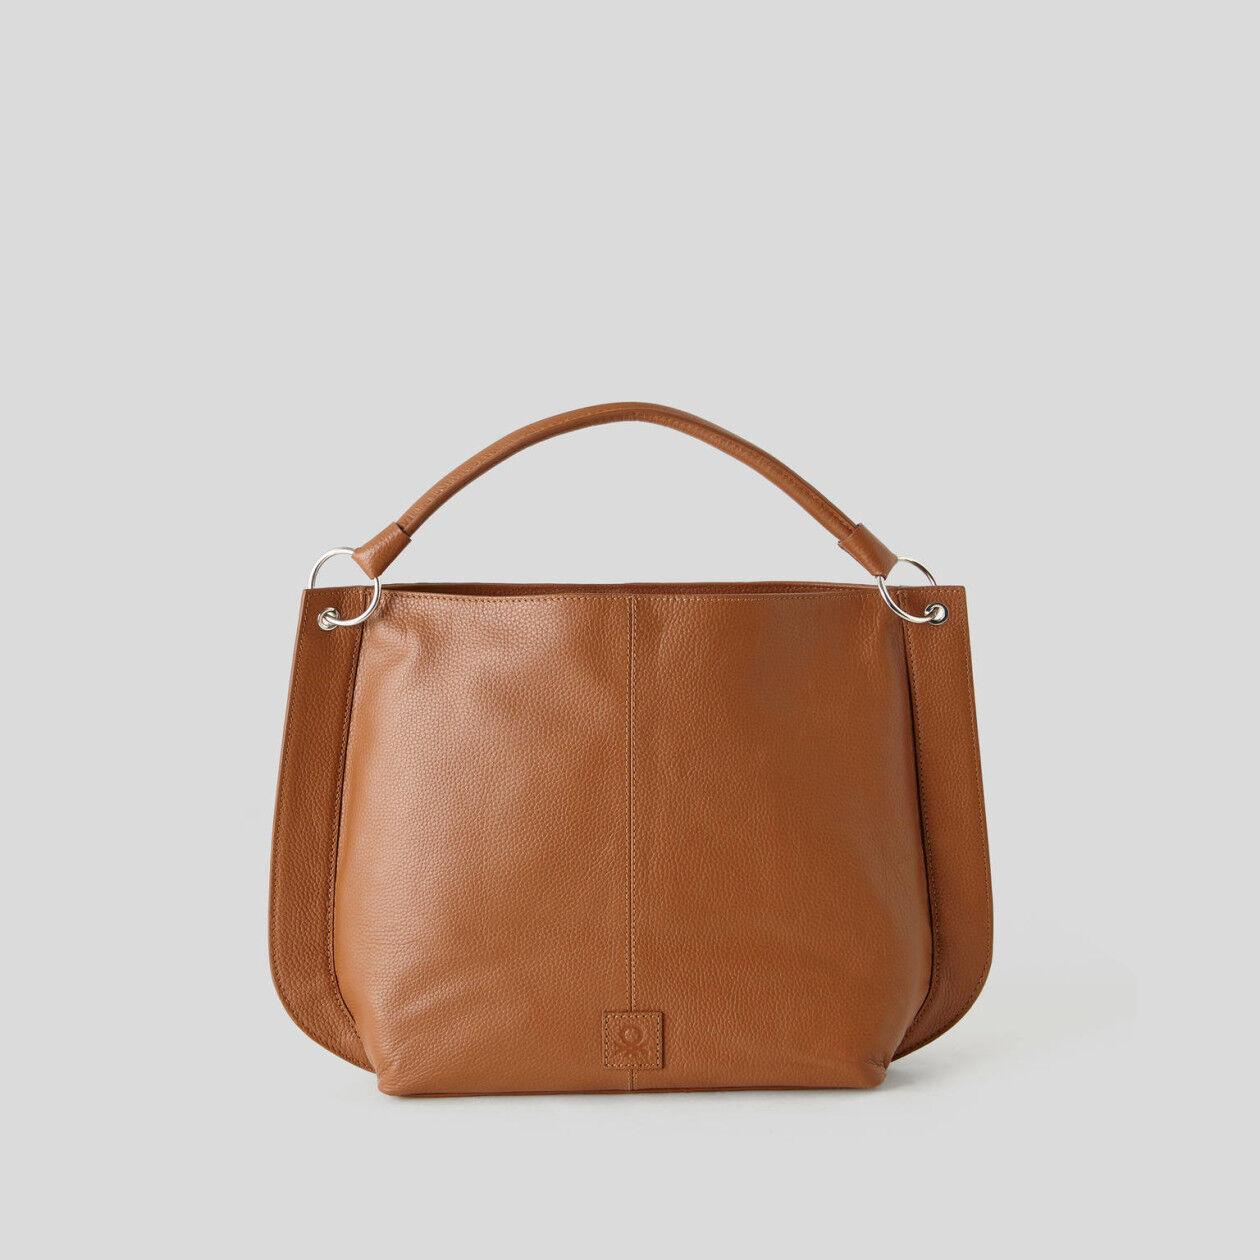 Hobo bag in genuine leather